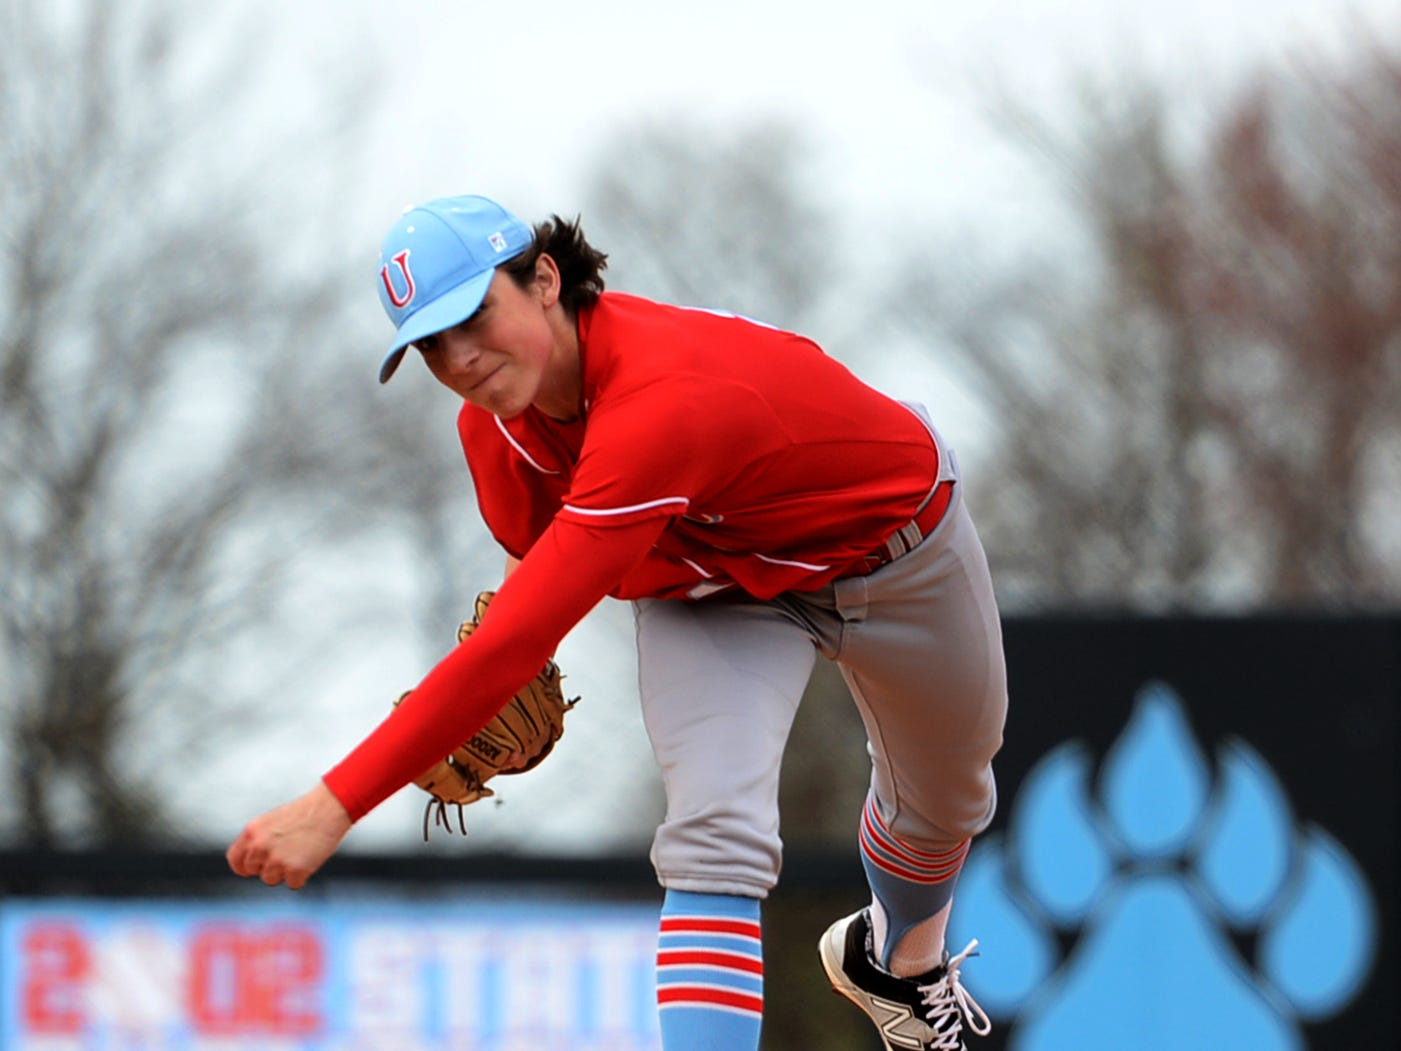 University School of Jackson's Ryan Rolison throws a pitch against Lexington earlier this season.